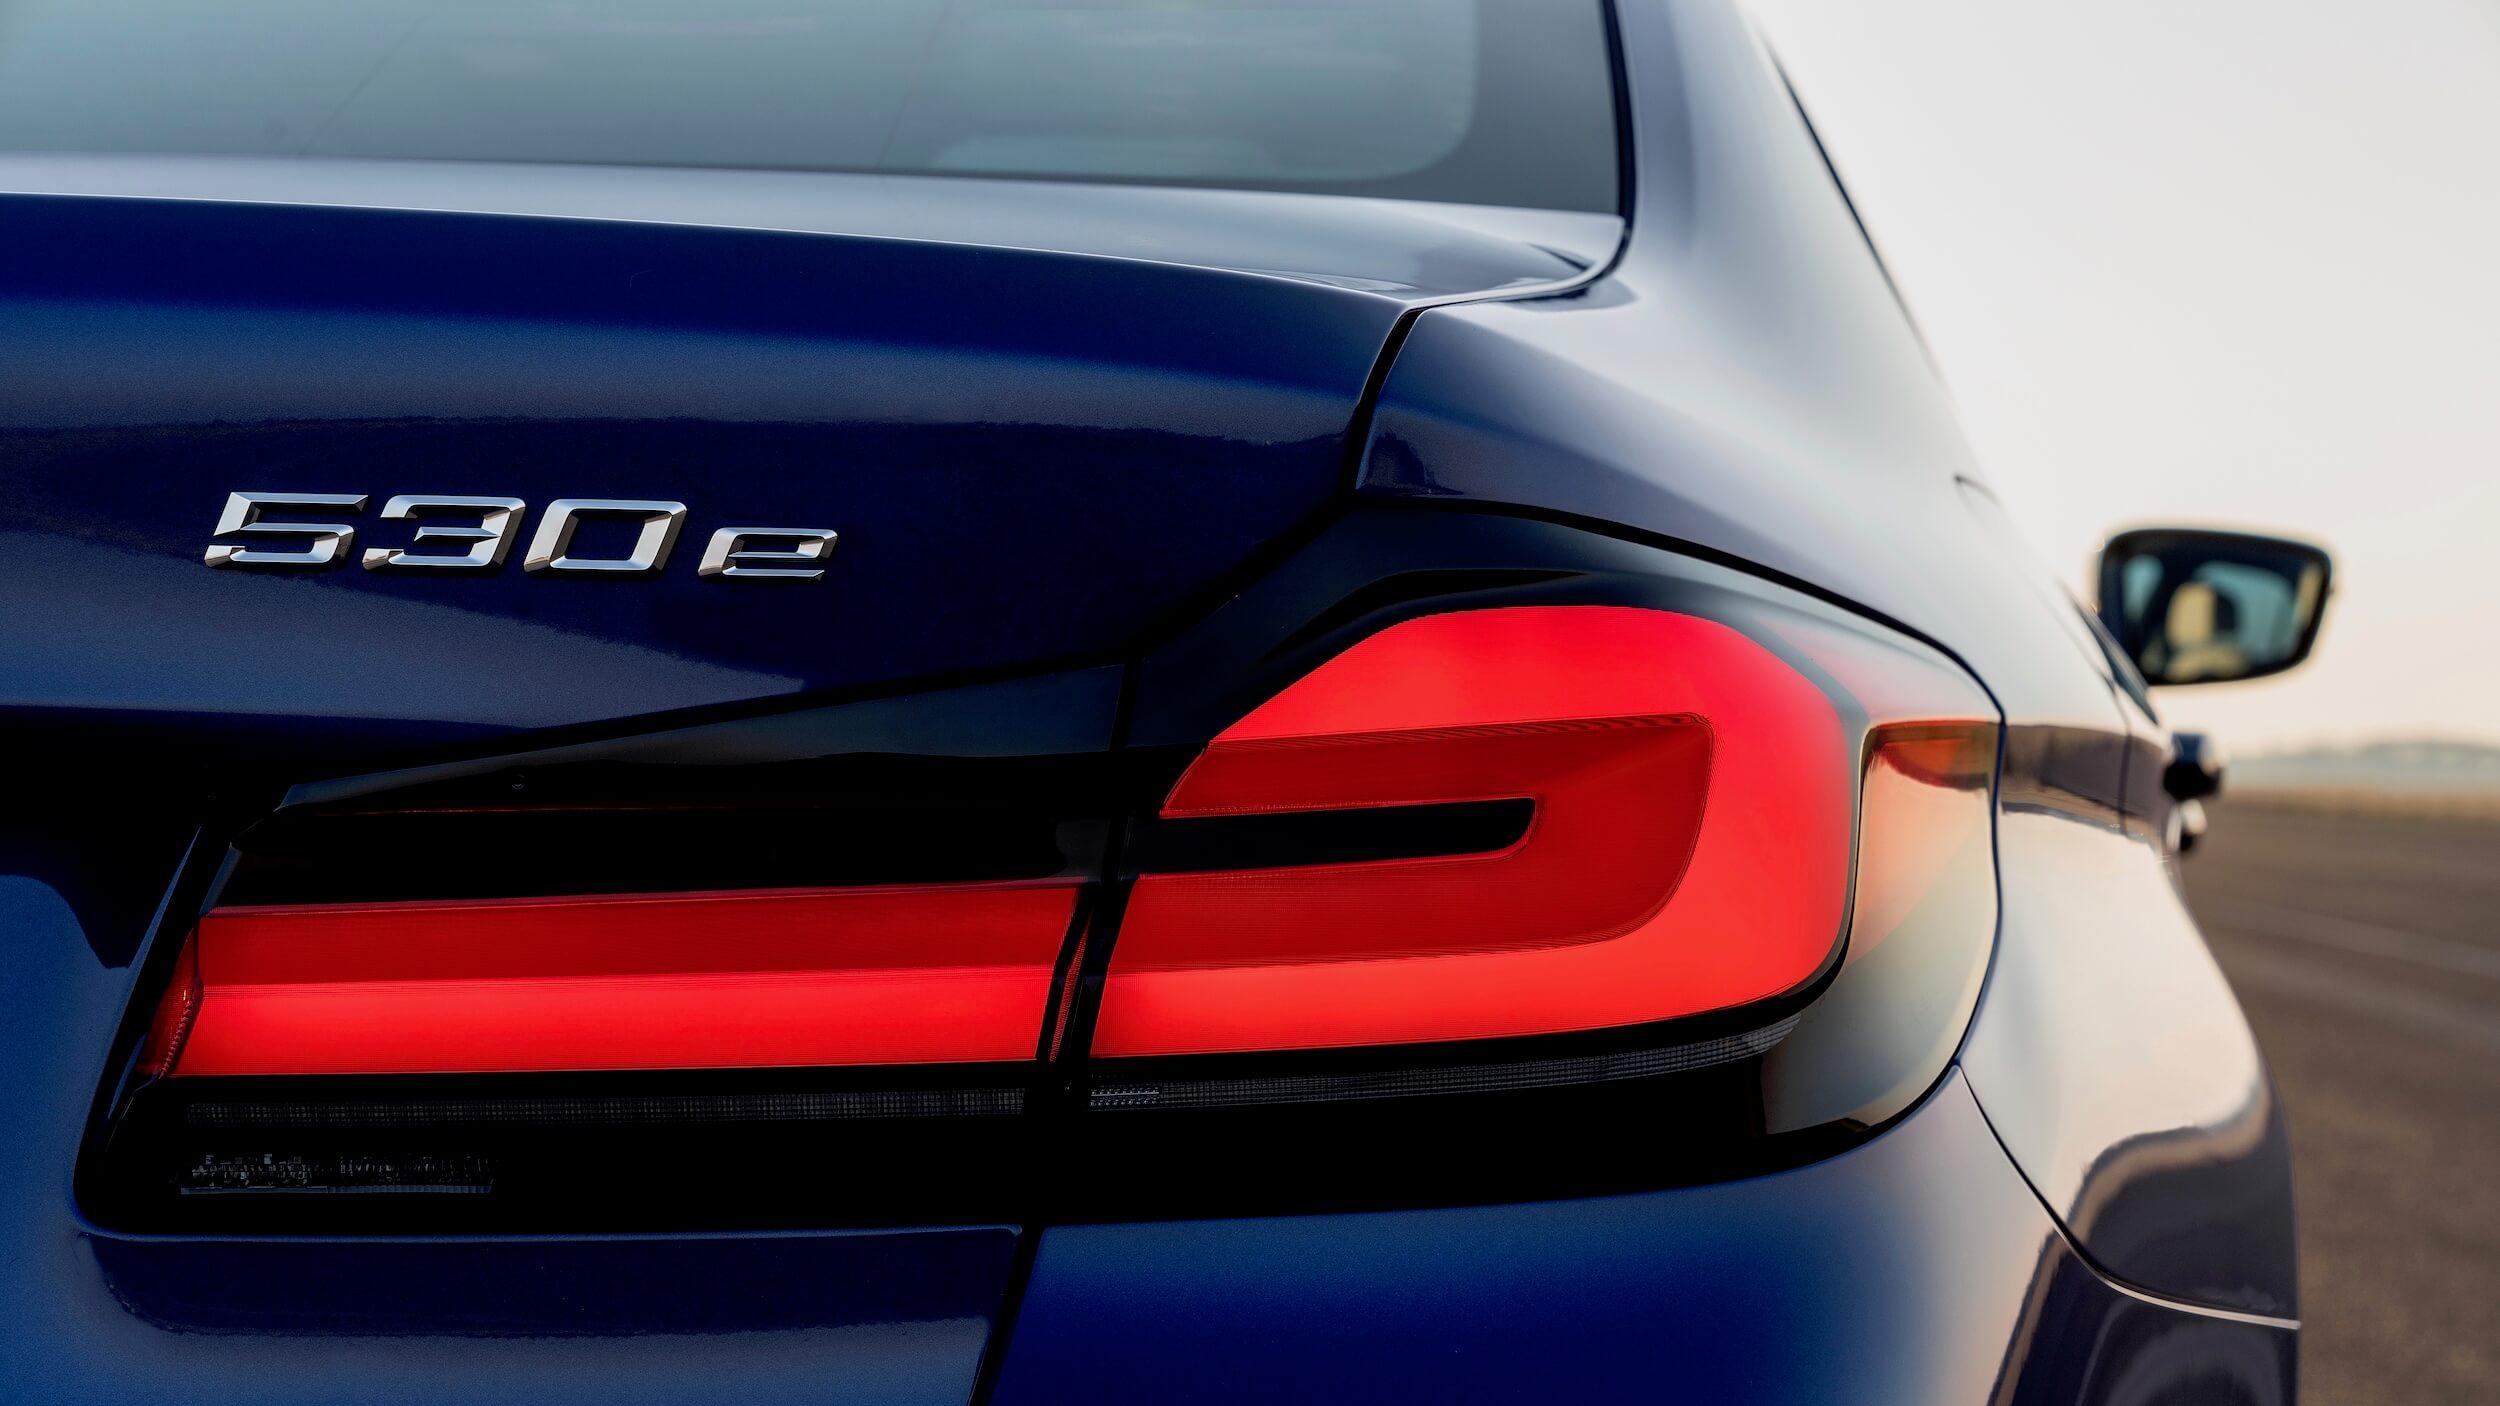 BMW 530e logotipo